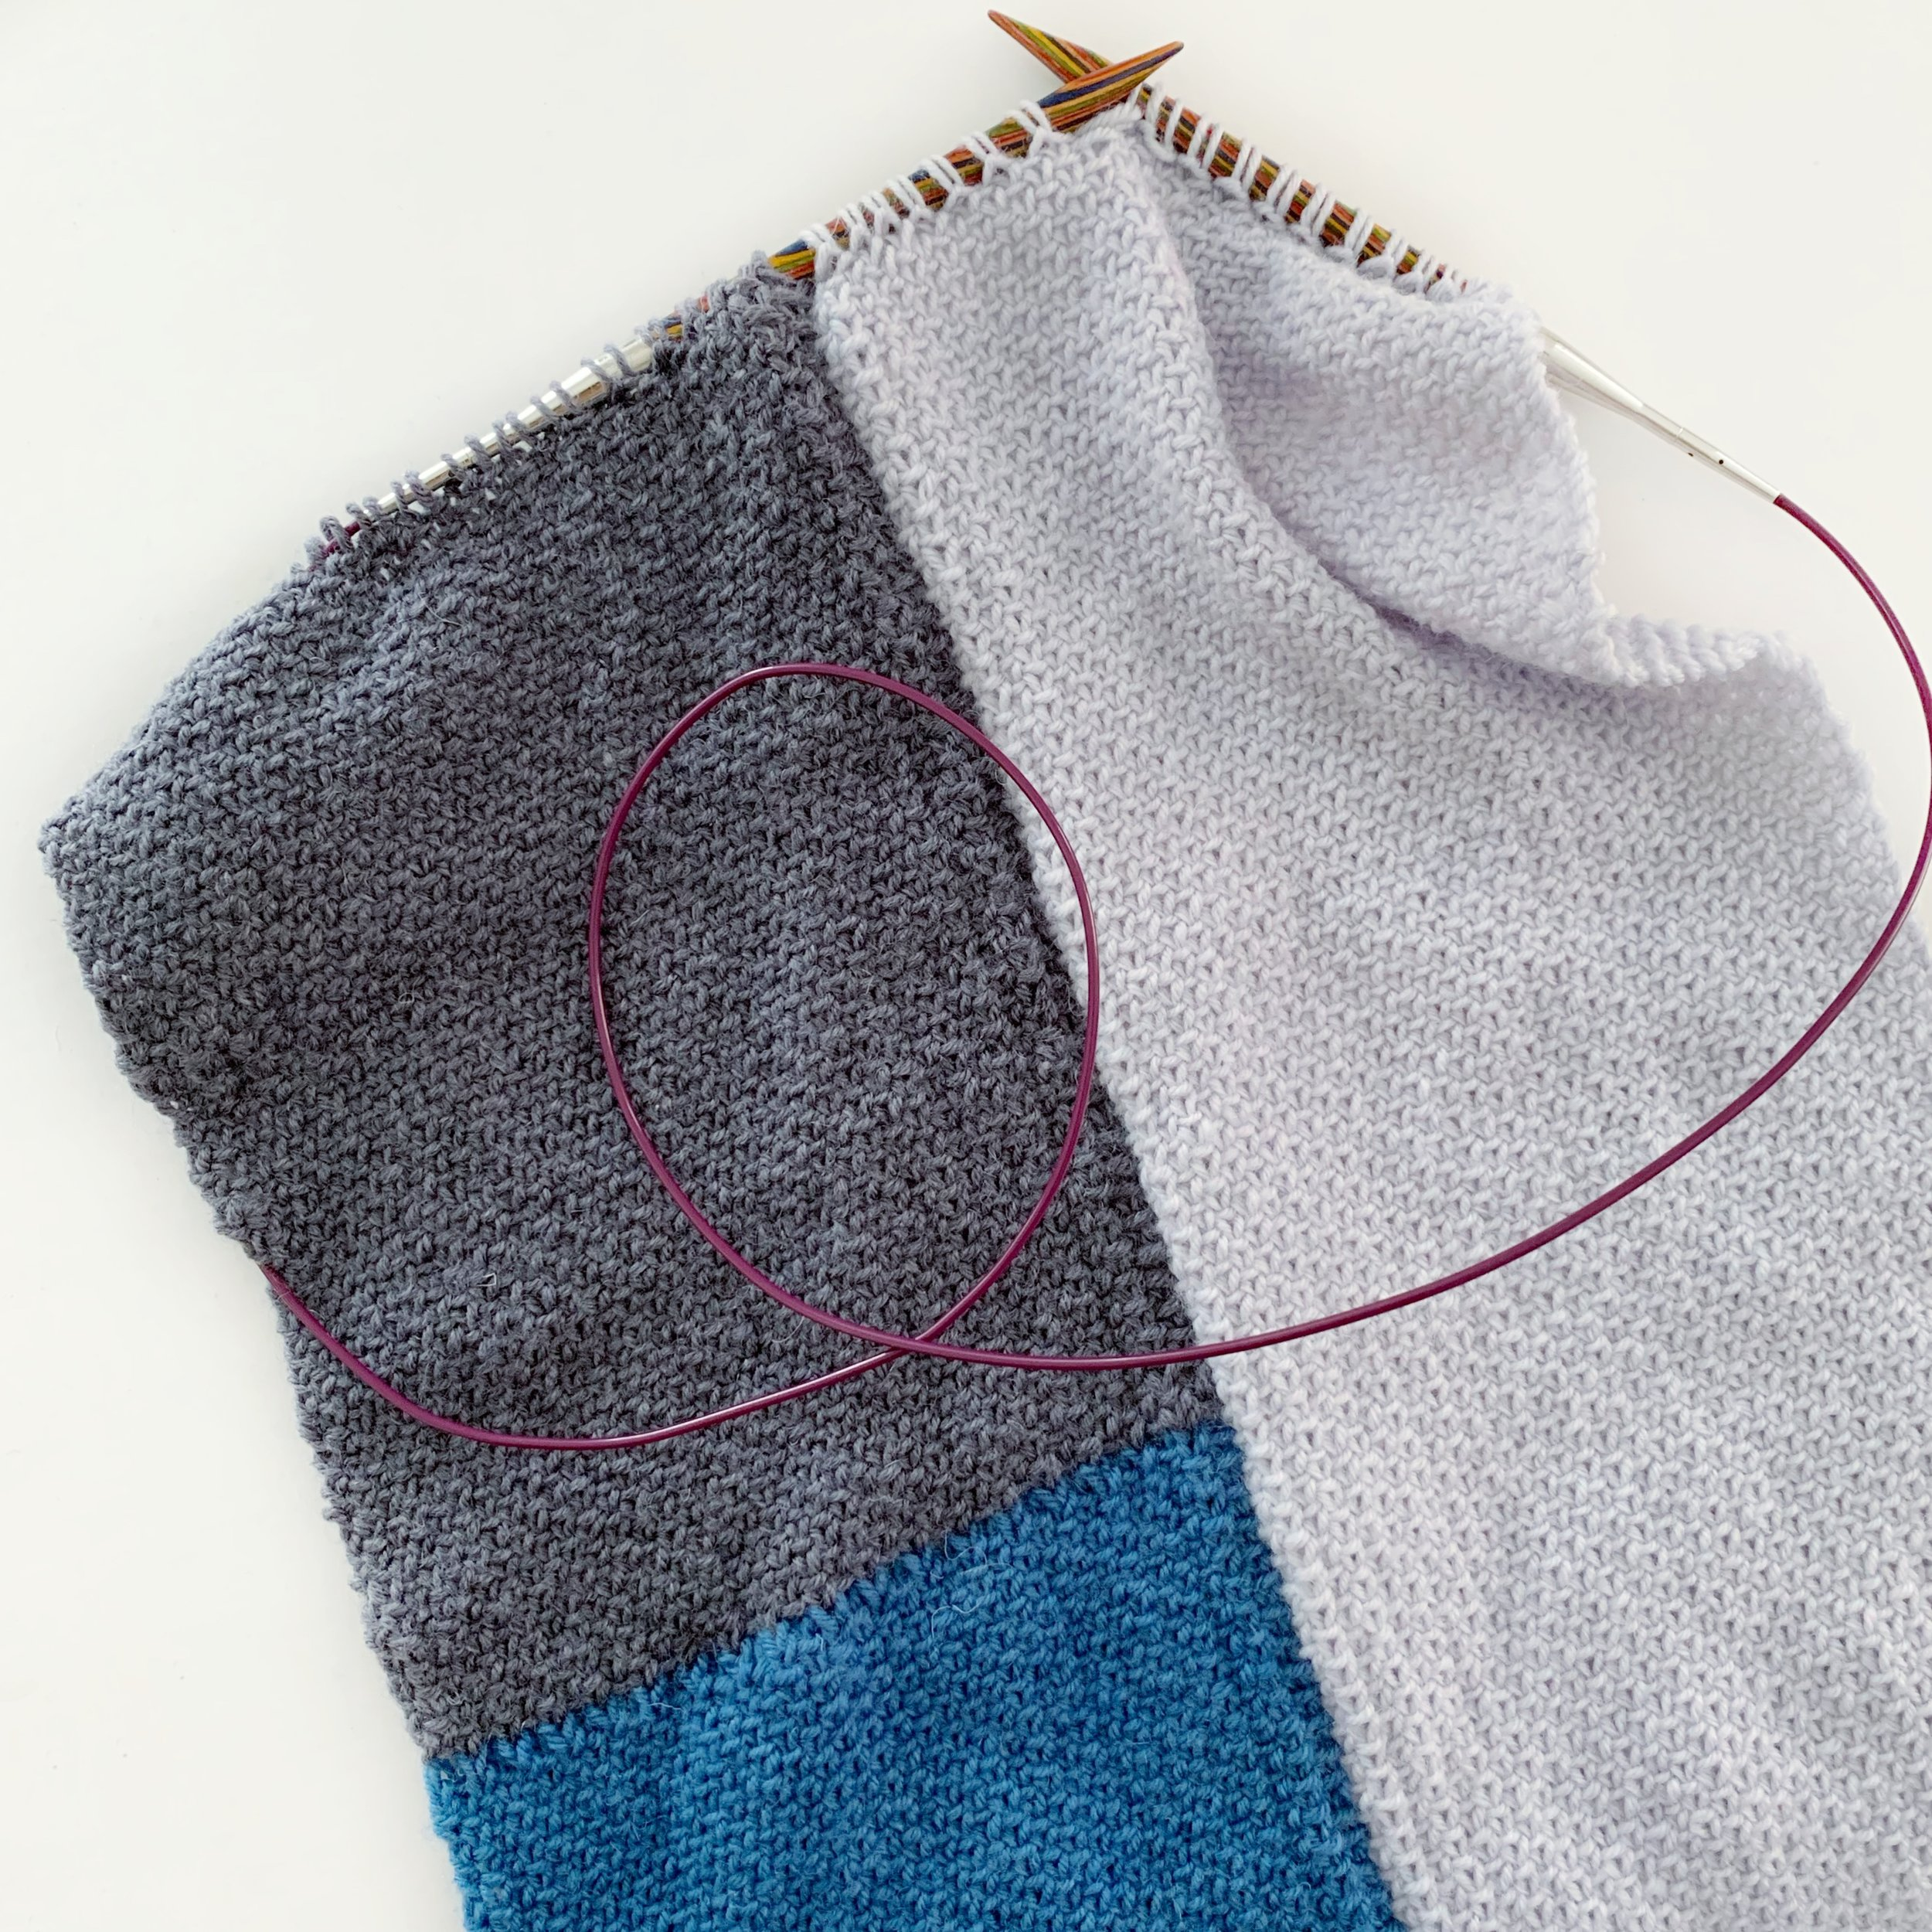 Knitting a flat scarf on circular needles.